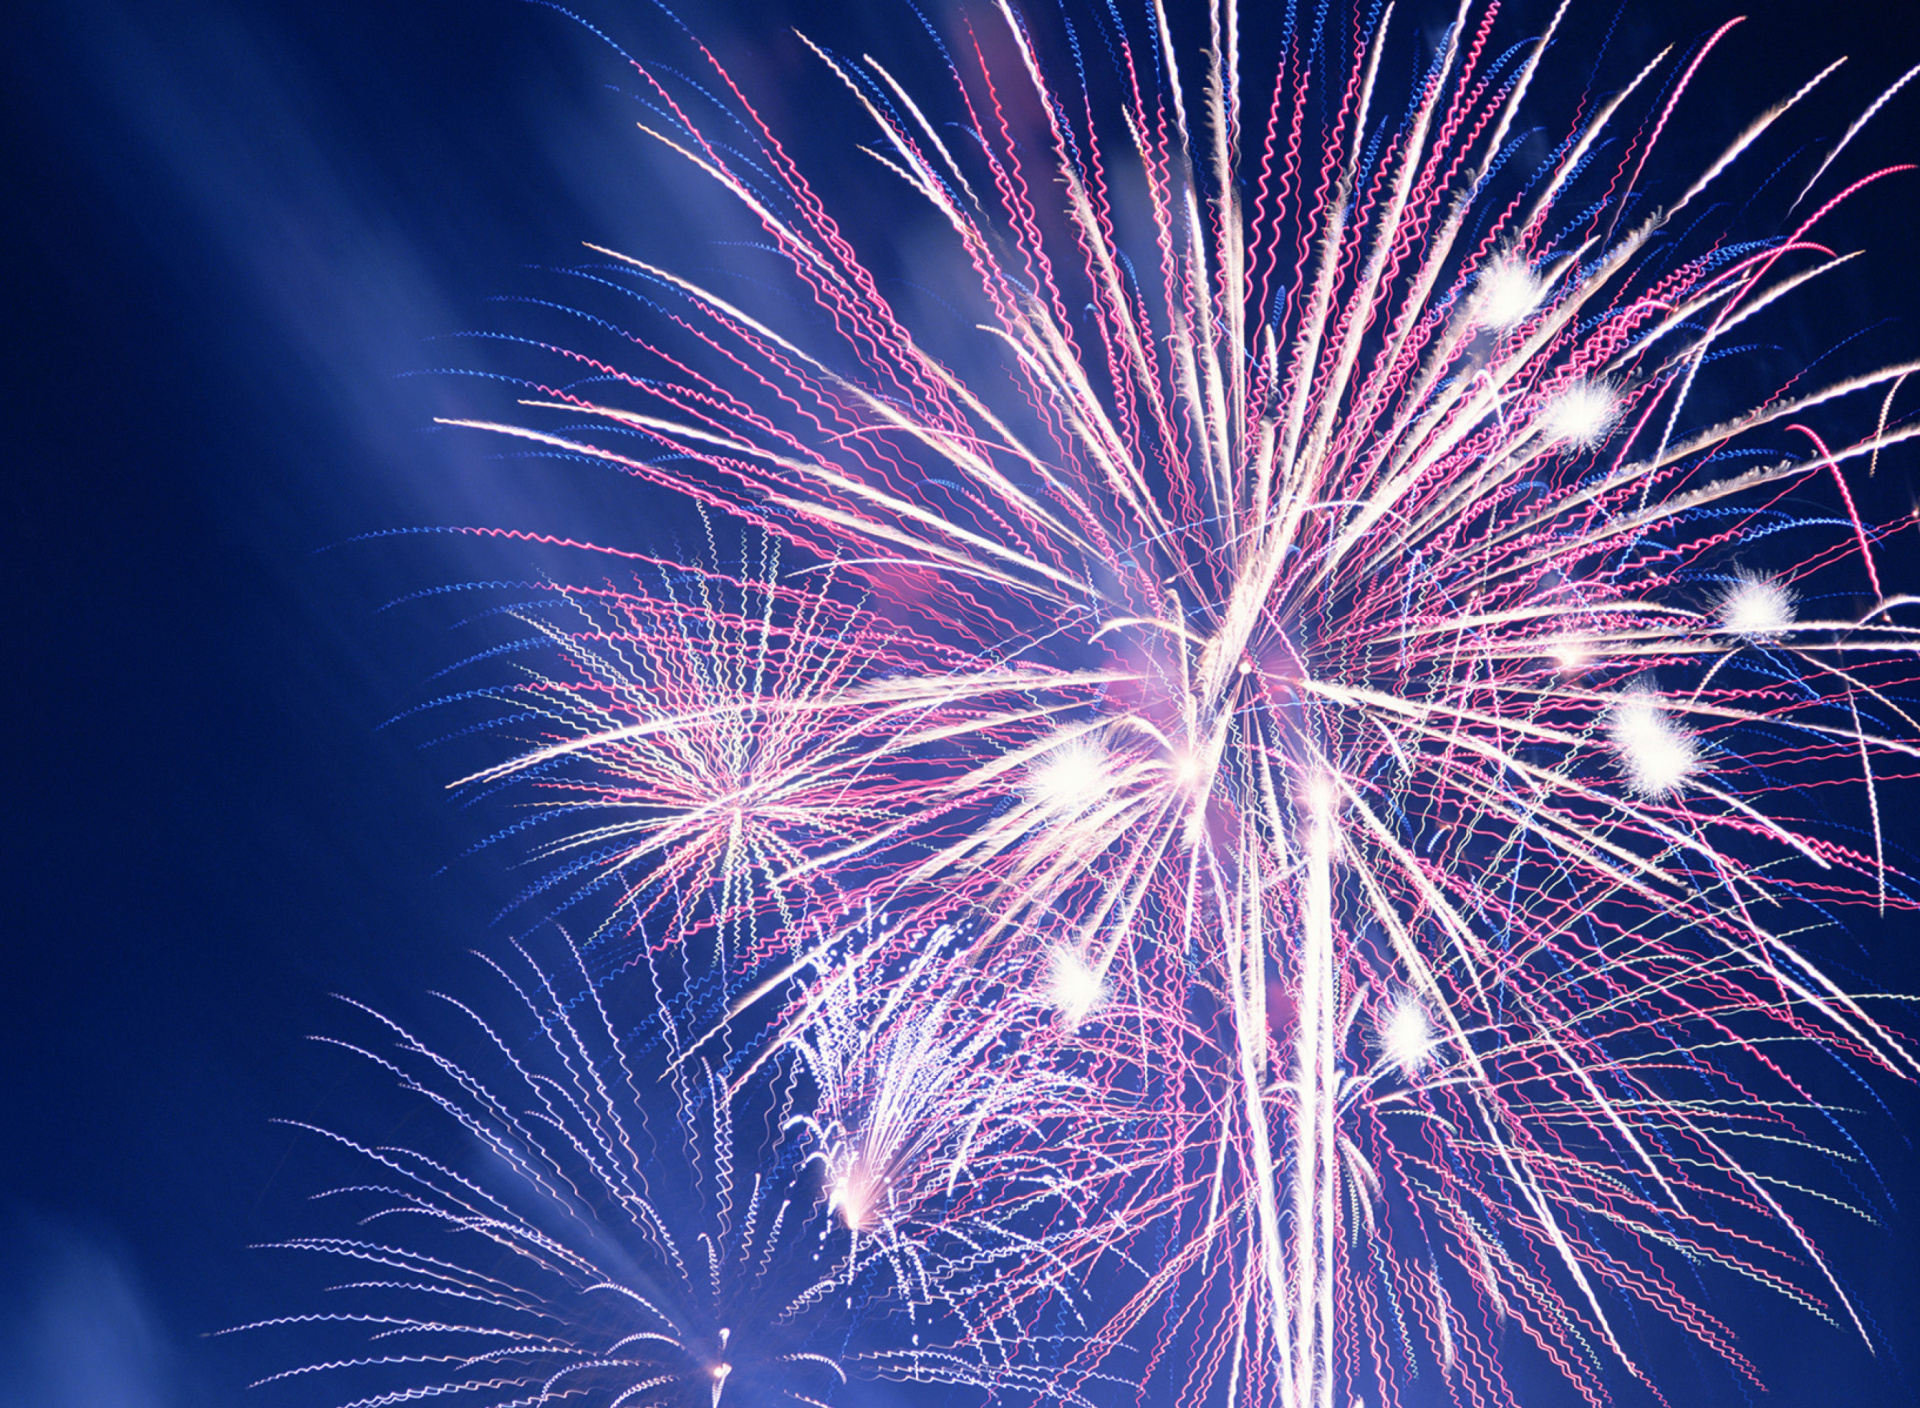 Fireworks Wallpaper Free: Firework Wallpapers Screensavers